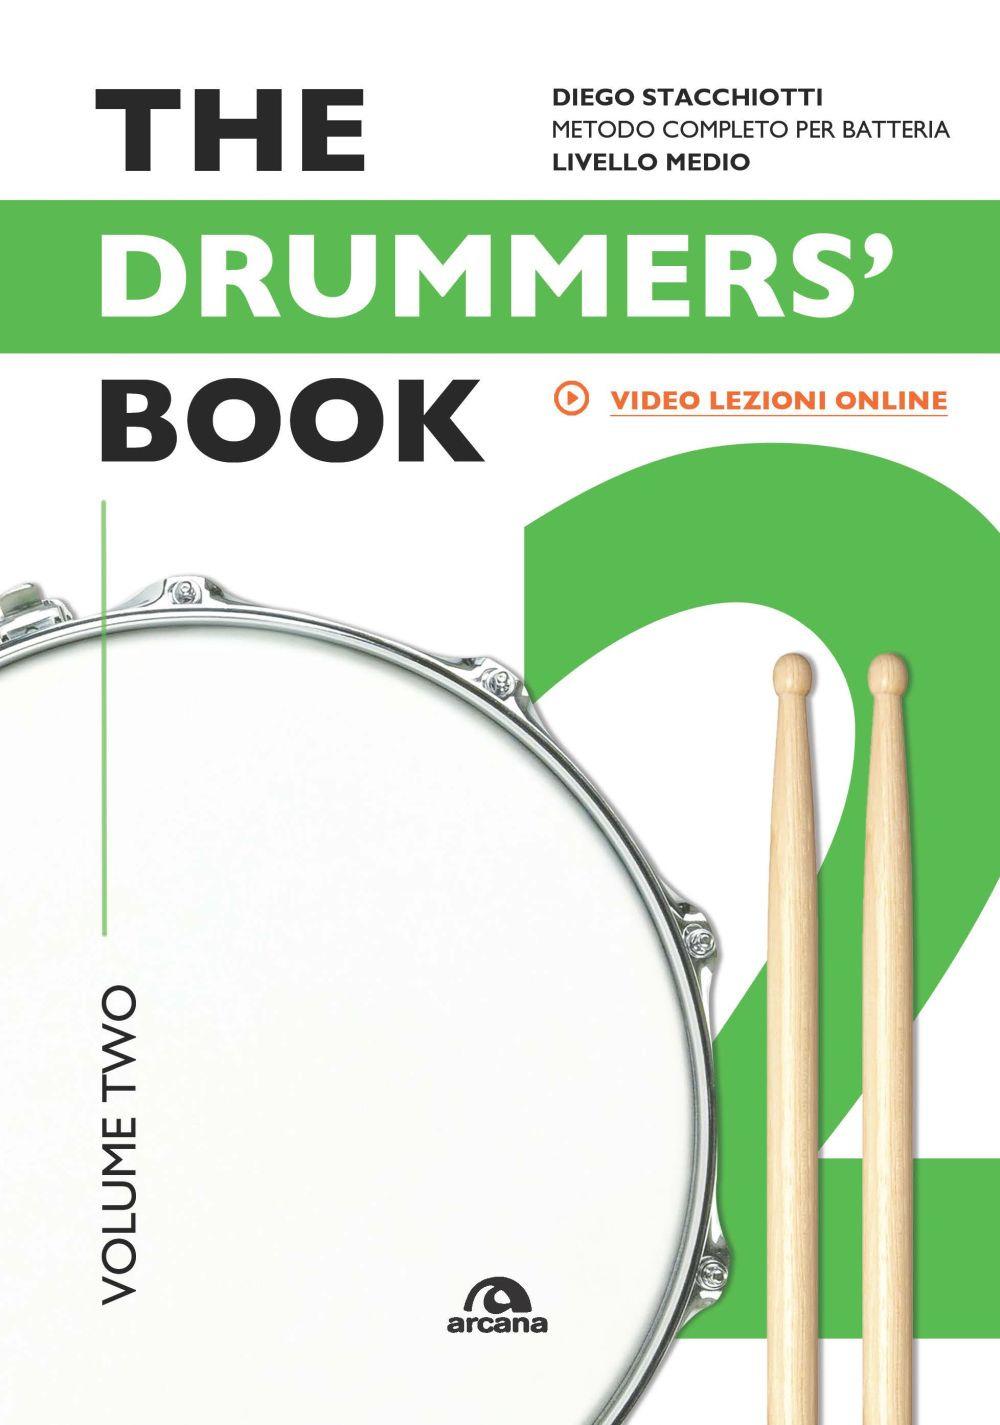 DRUMMERS'S BOOK. METODO COMPLETO PER BATTERIA VOLUME 2 (THE) - Stacchiotti Diego - 9788862319973